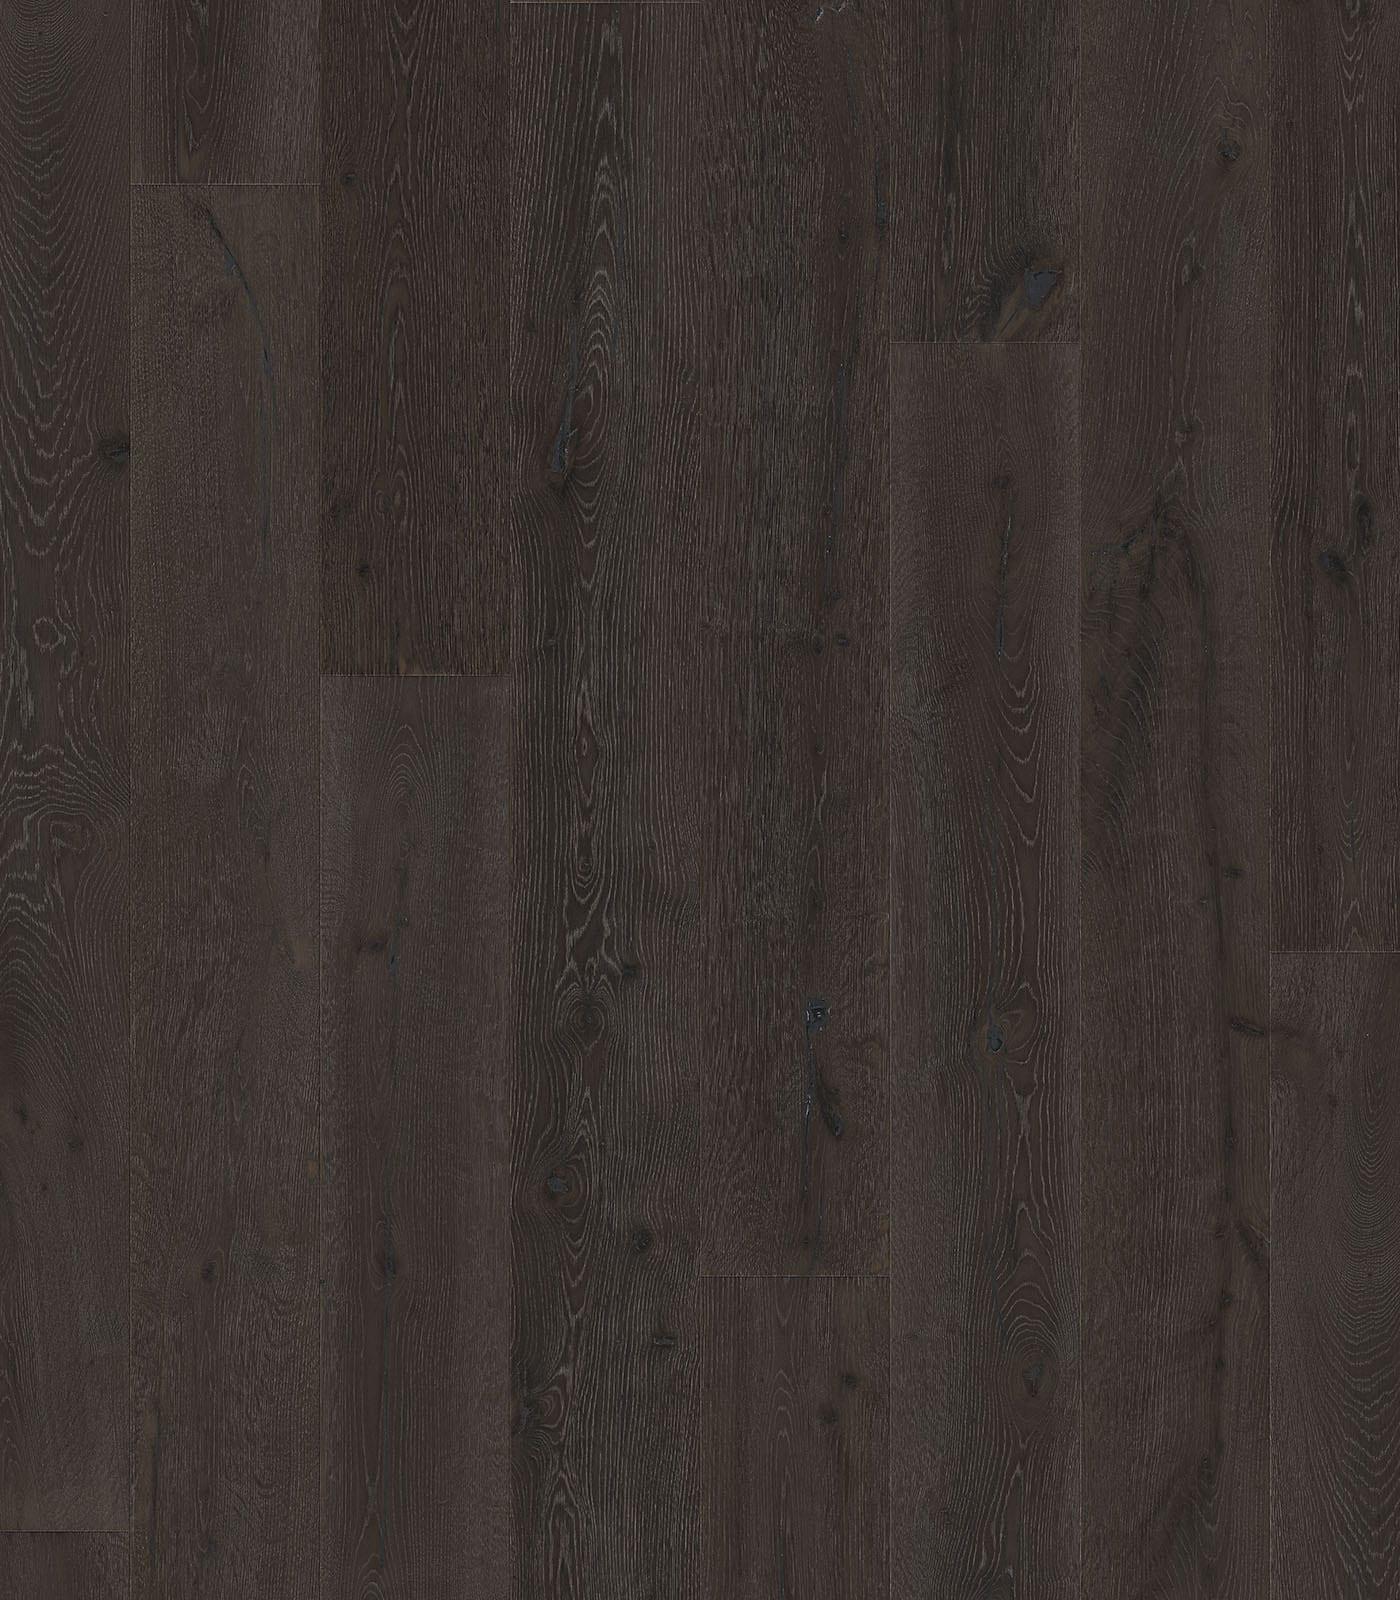 Sardinia-Lifestyle Collection-European Oak Floors-flat